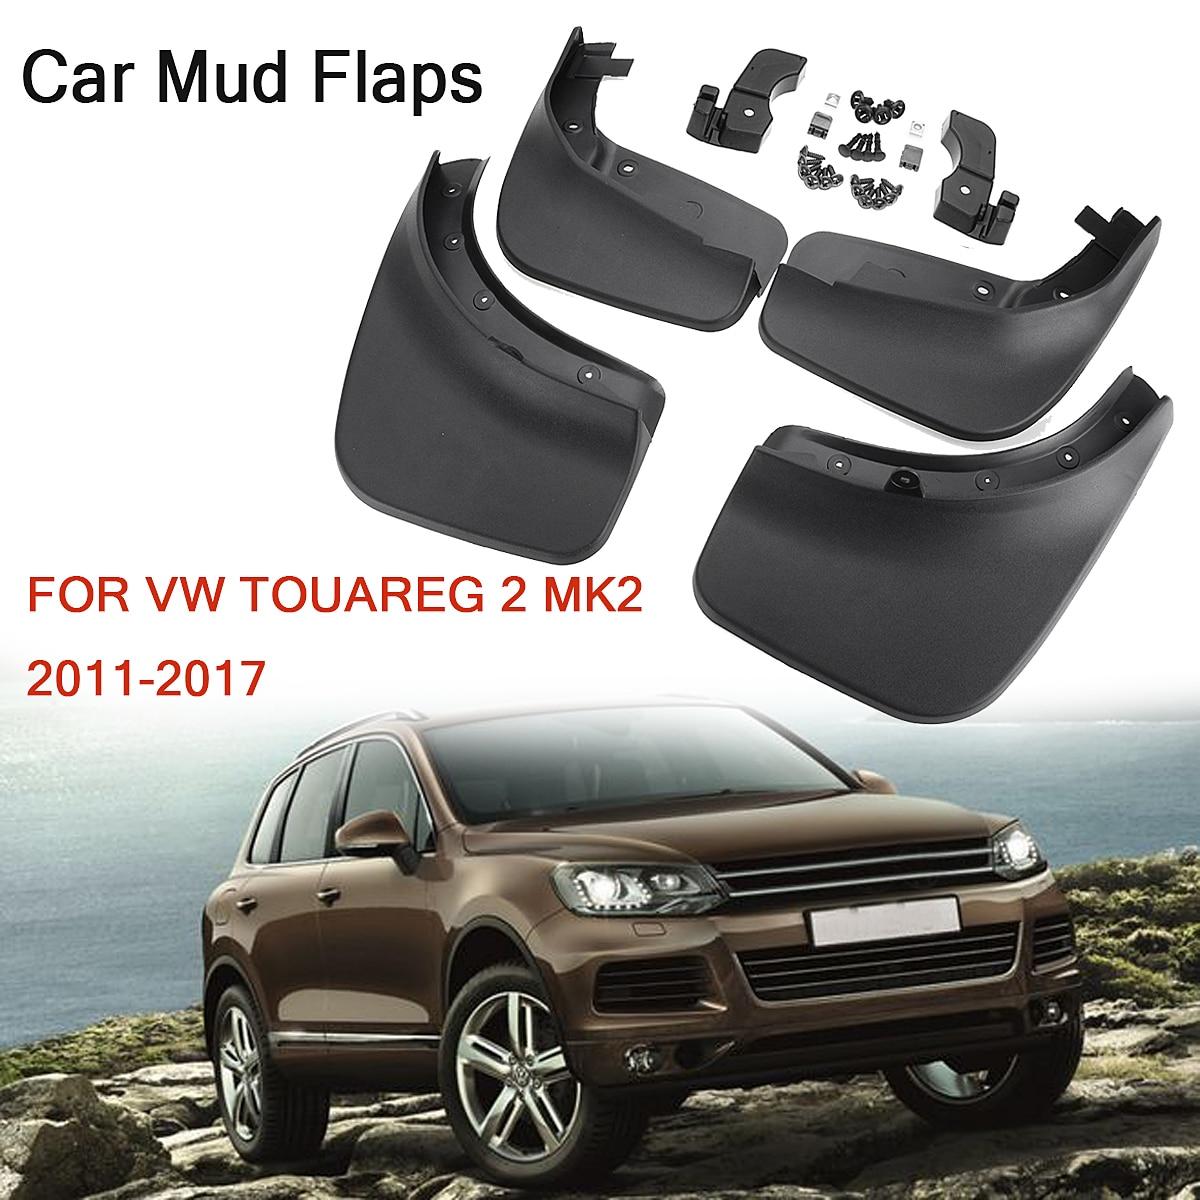 4 piezas para VW Touareg 2 Mk2 2011-2017 frente trasero guardabarros Mud Flaps guardabarros 2012 2013 2014 2015 2016